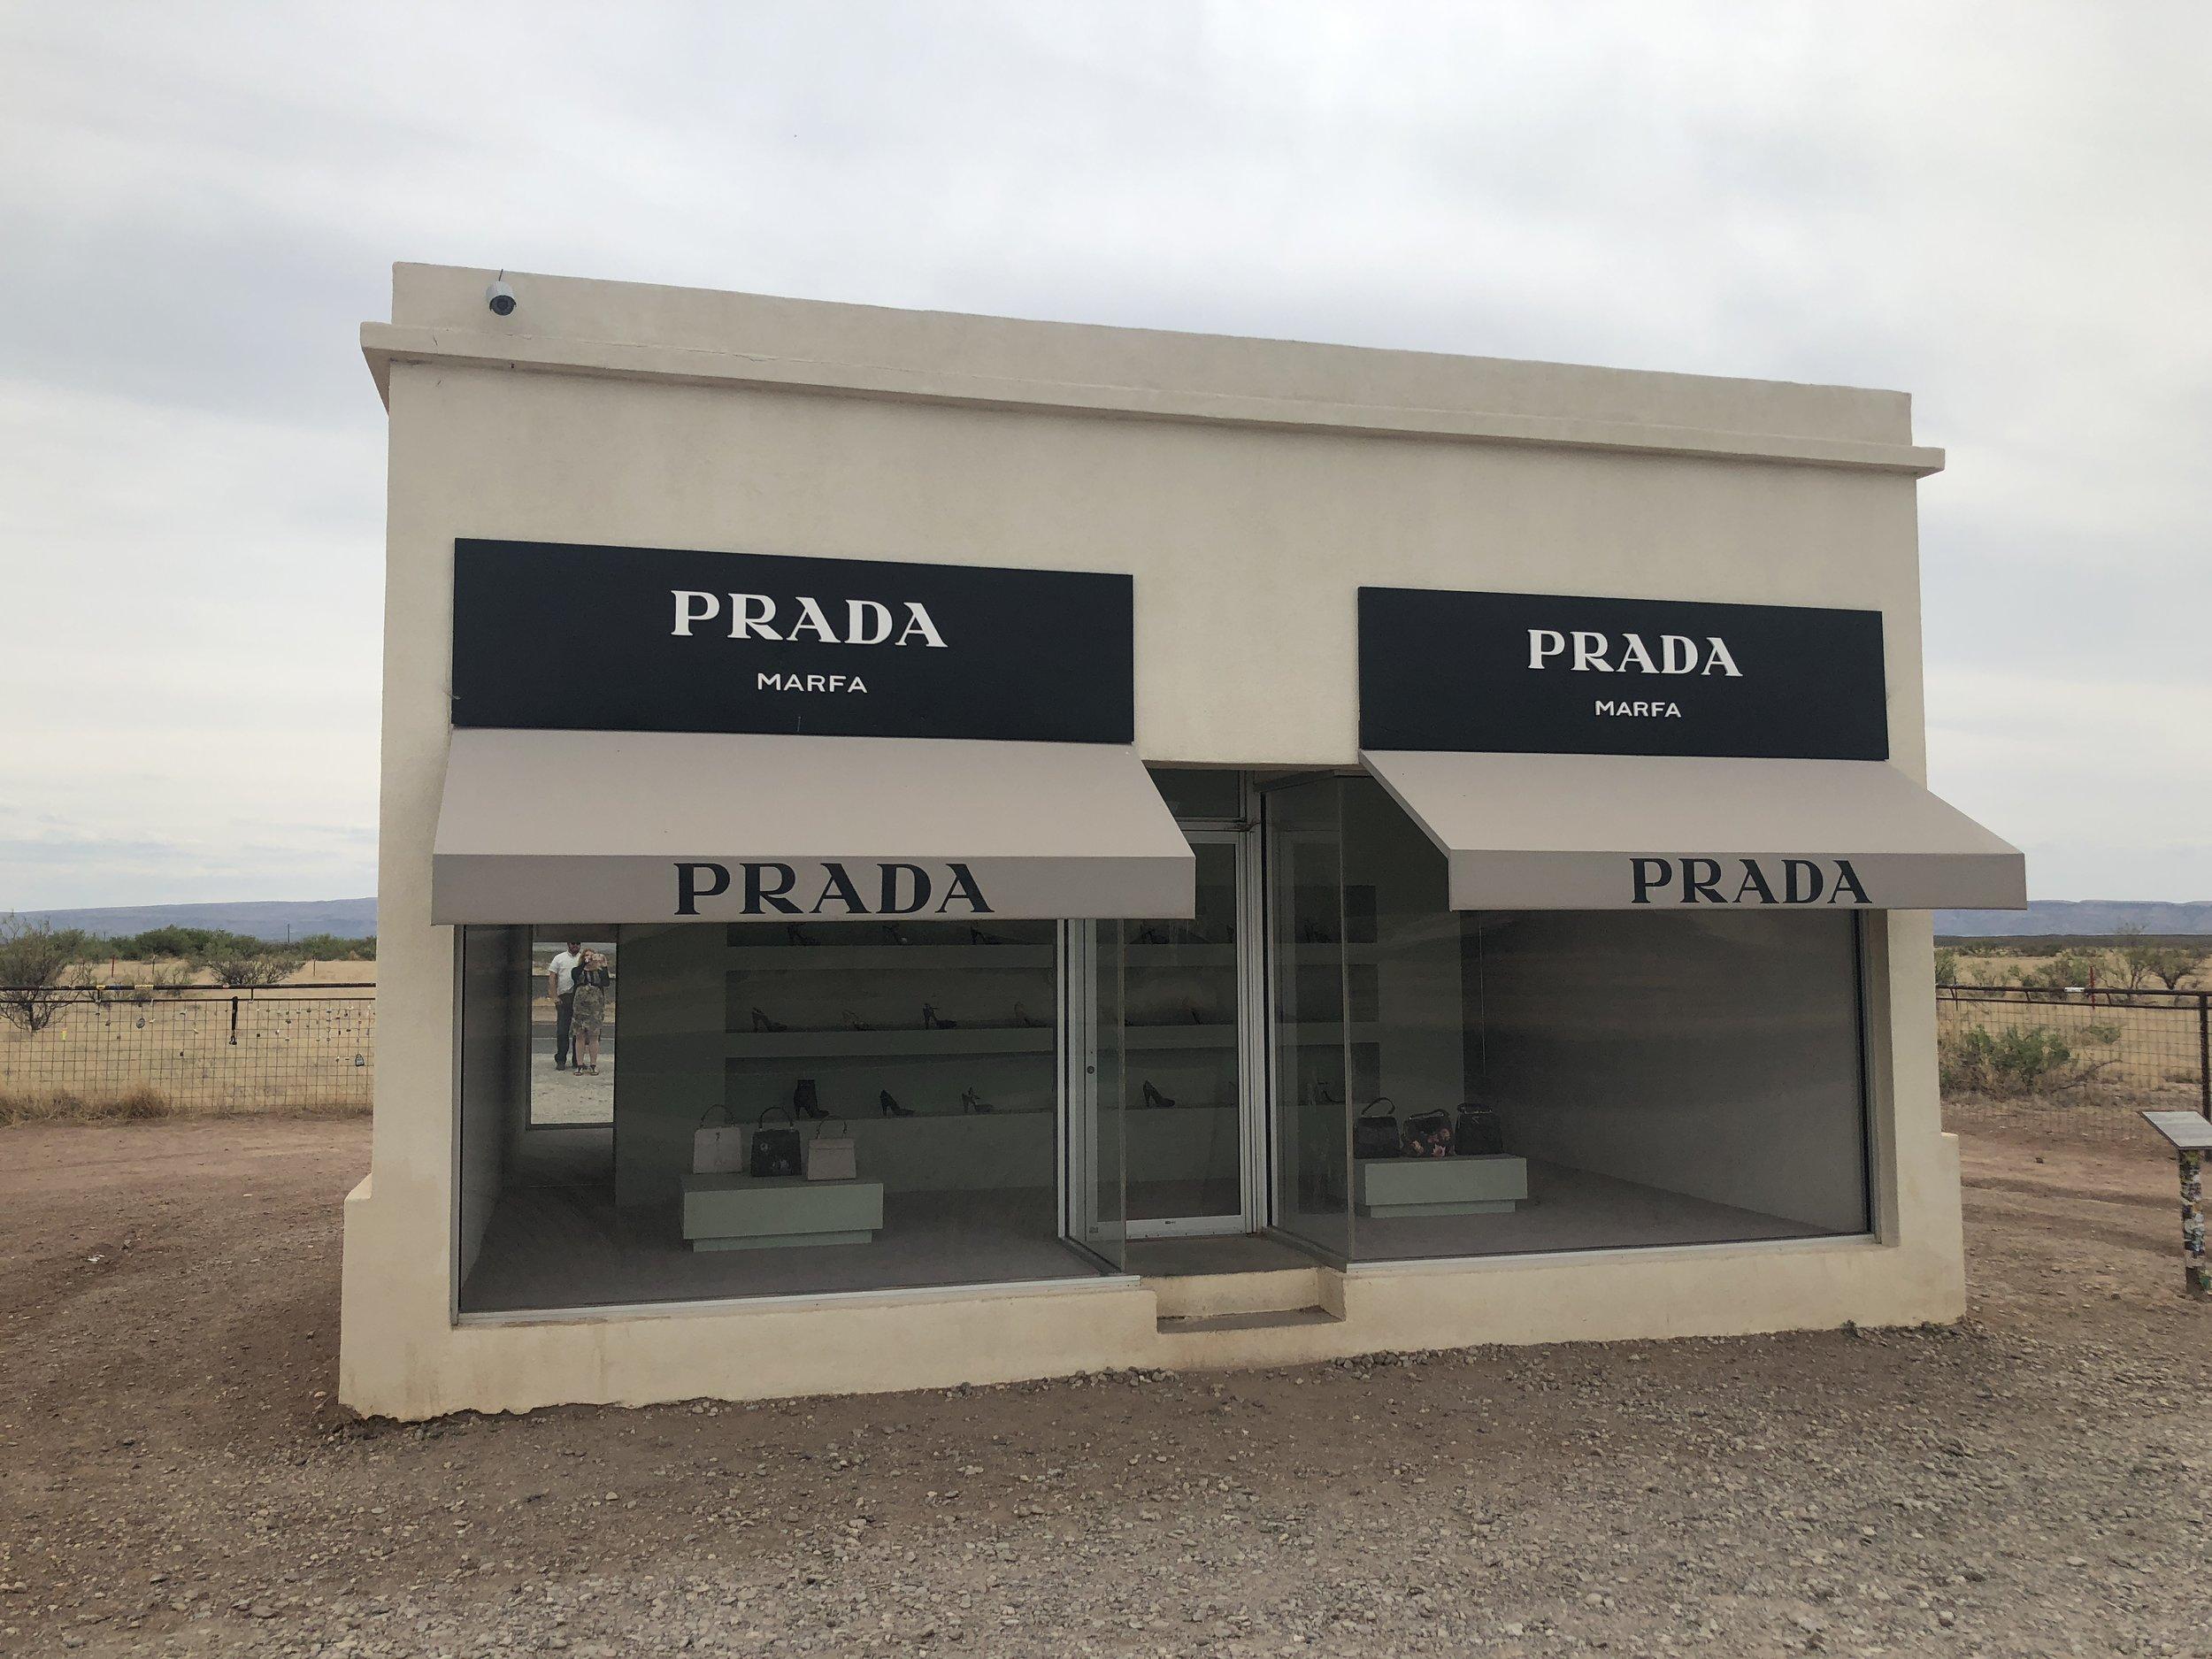 Prada Marfa installation on Highway 90.